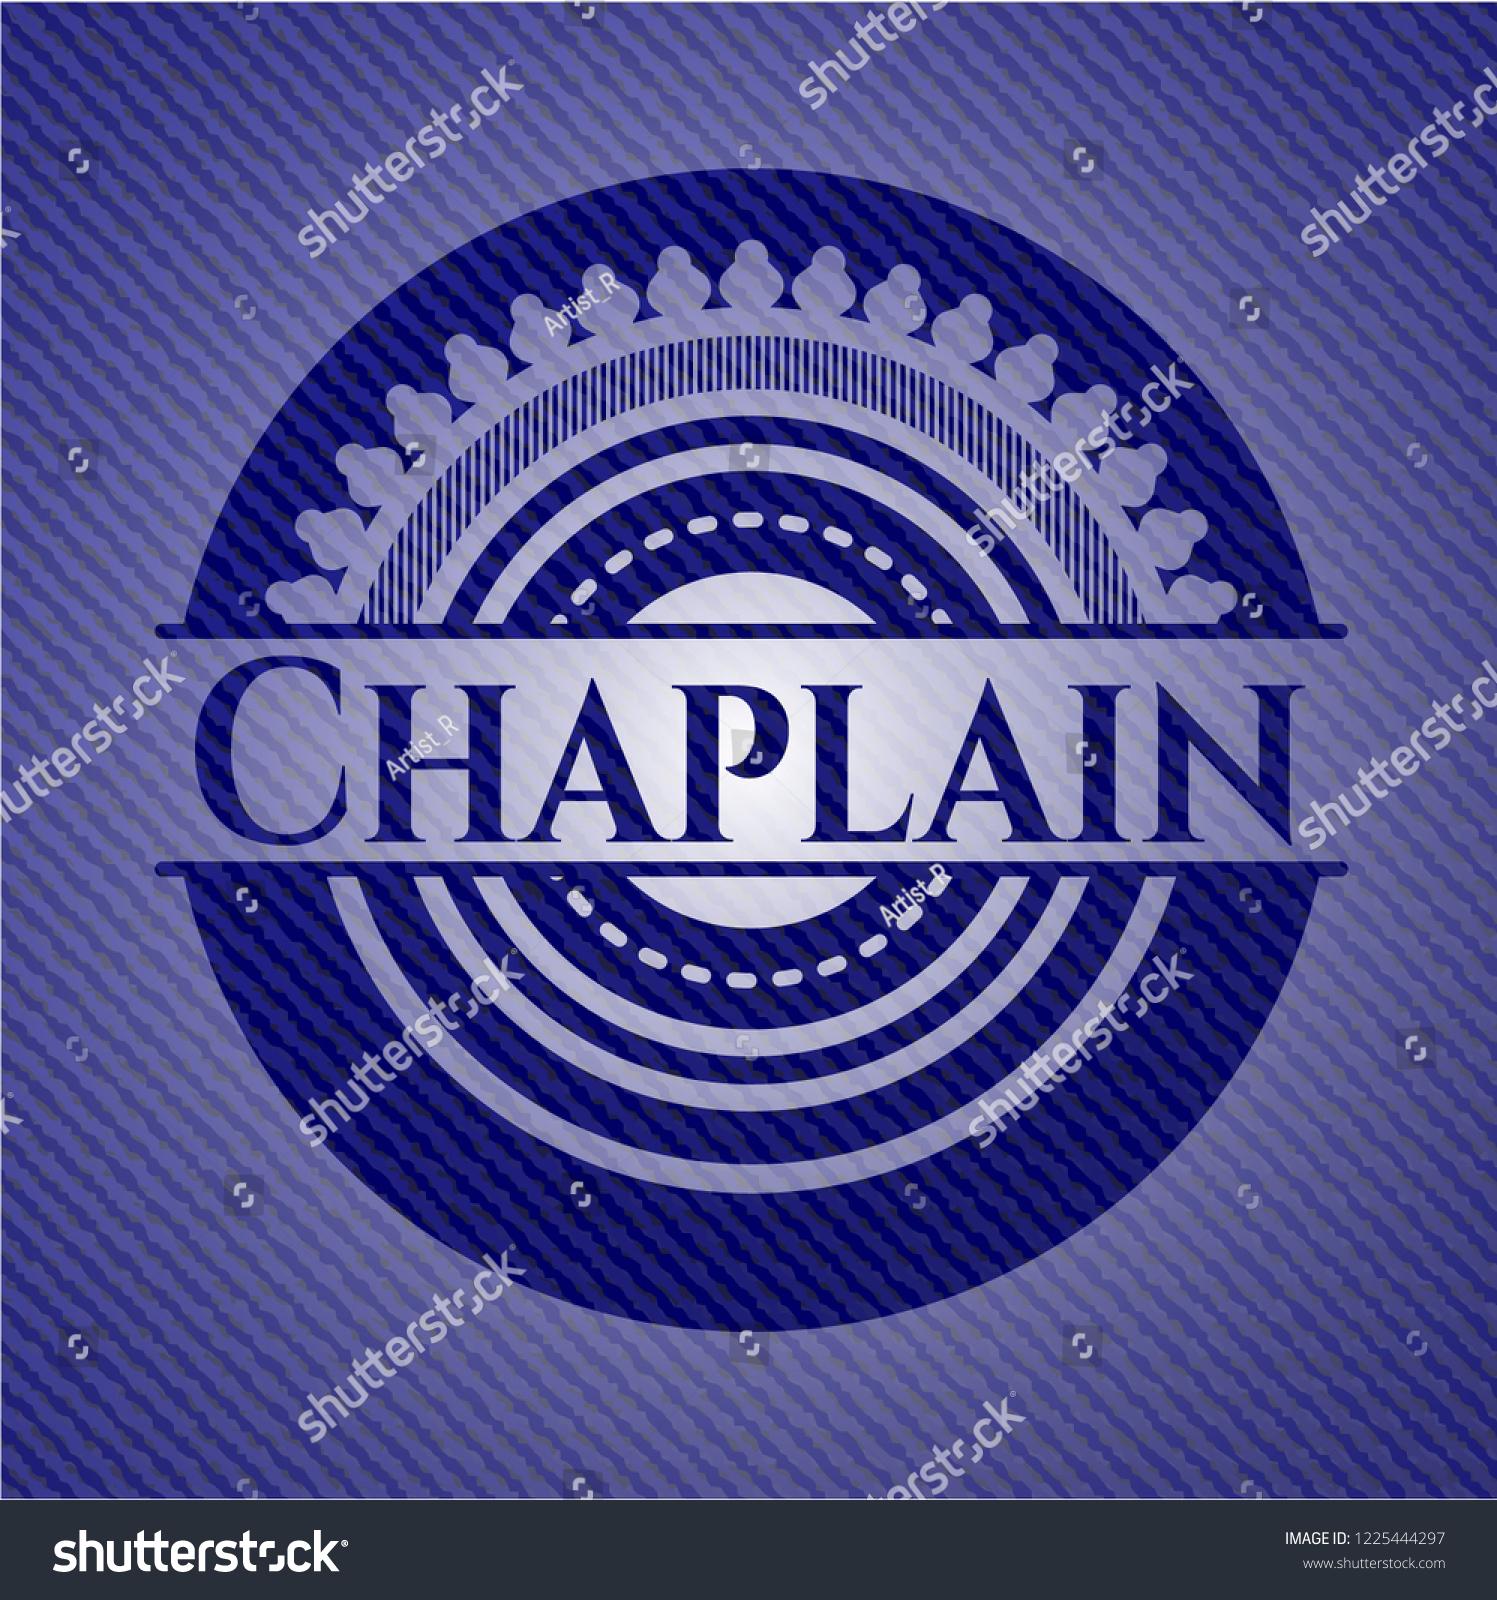 Chaplain Badge Denim Background Stock Vector Royalty 1225444297 1497x1600